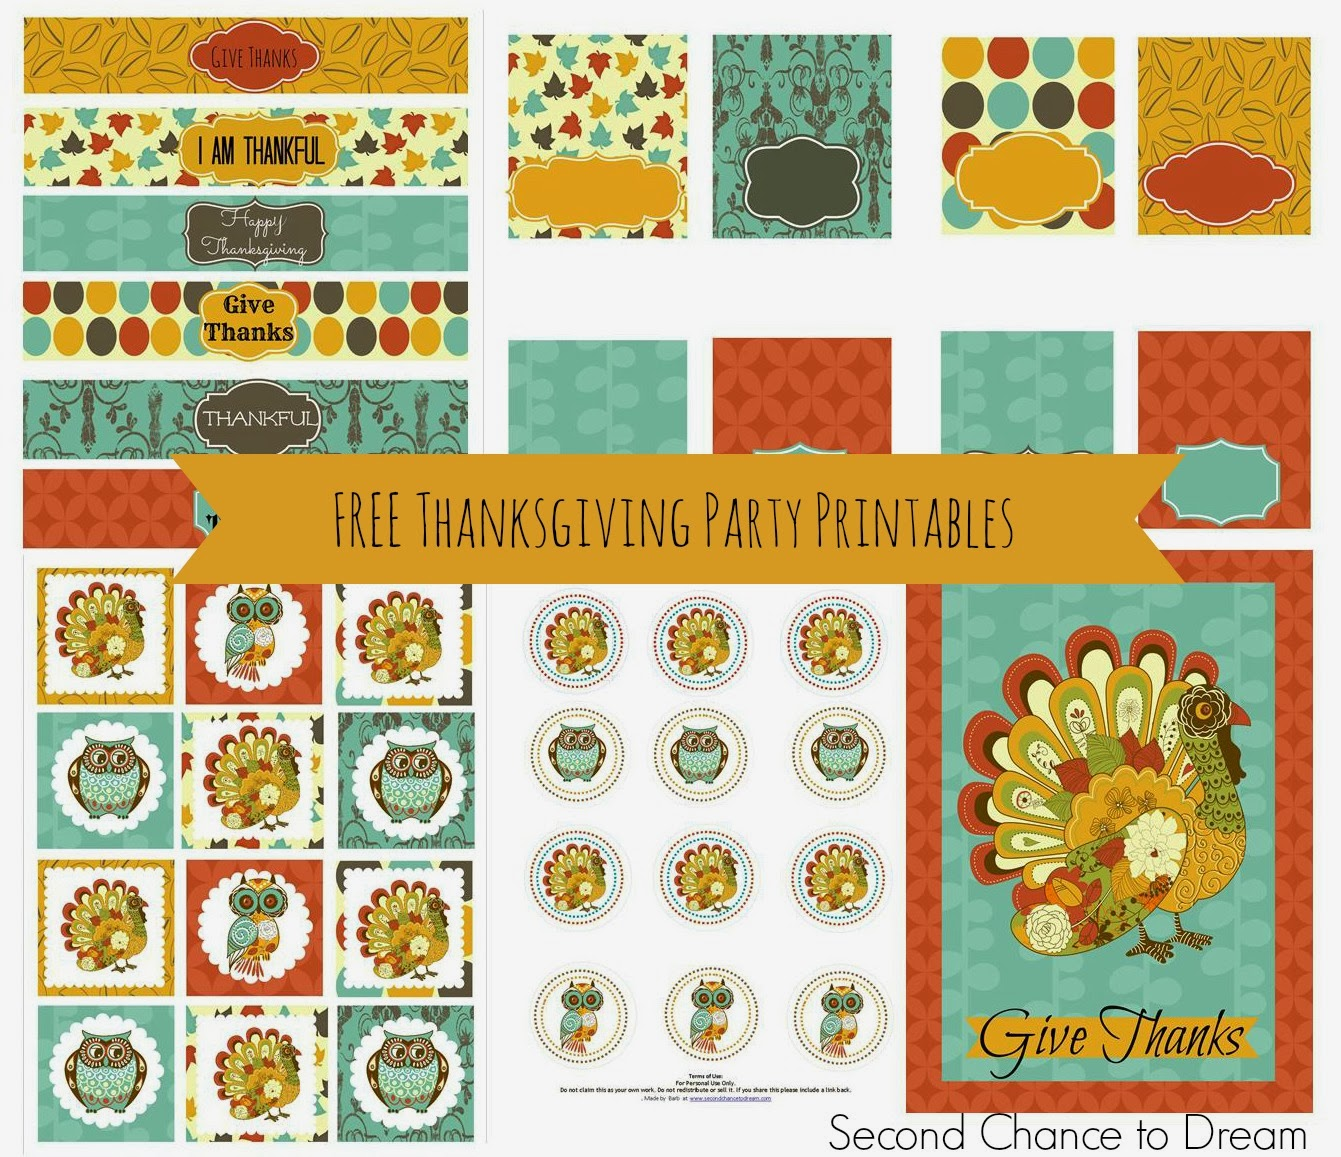 Free Thanksgiving Party Printables Set 1